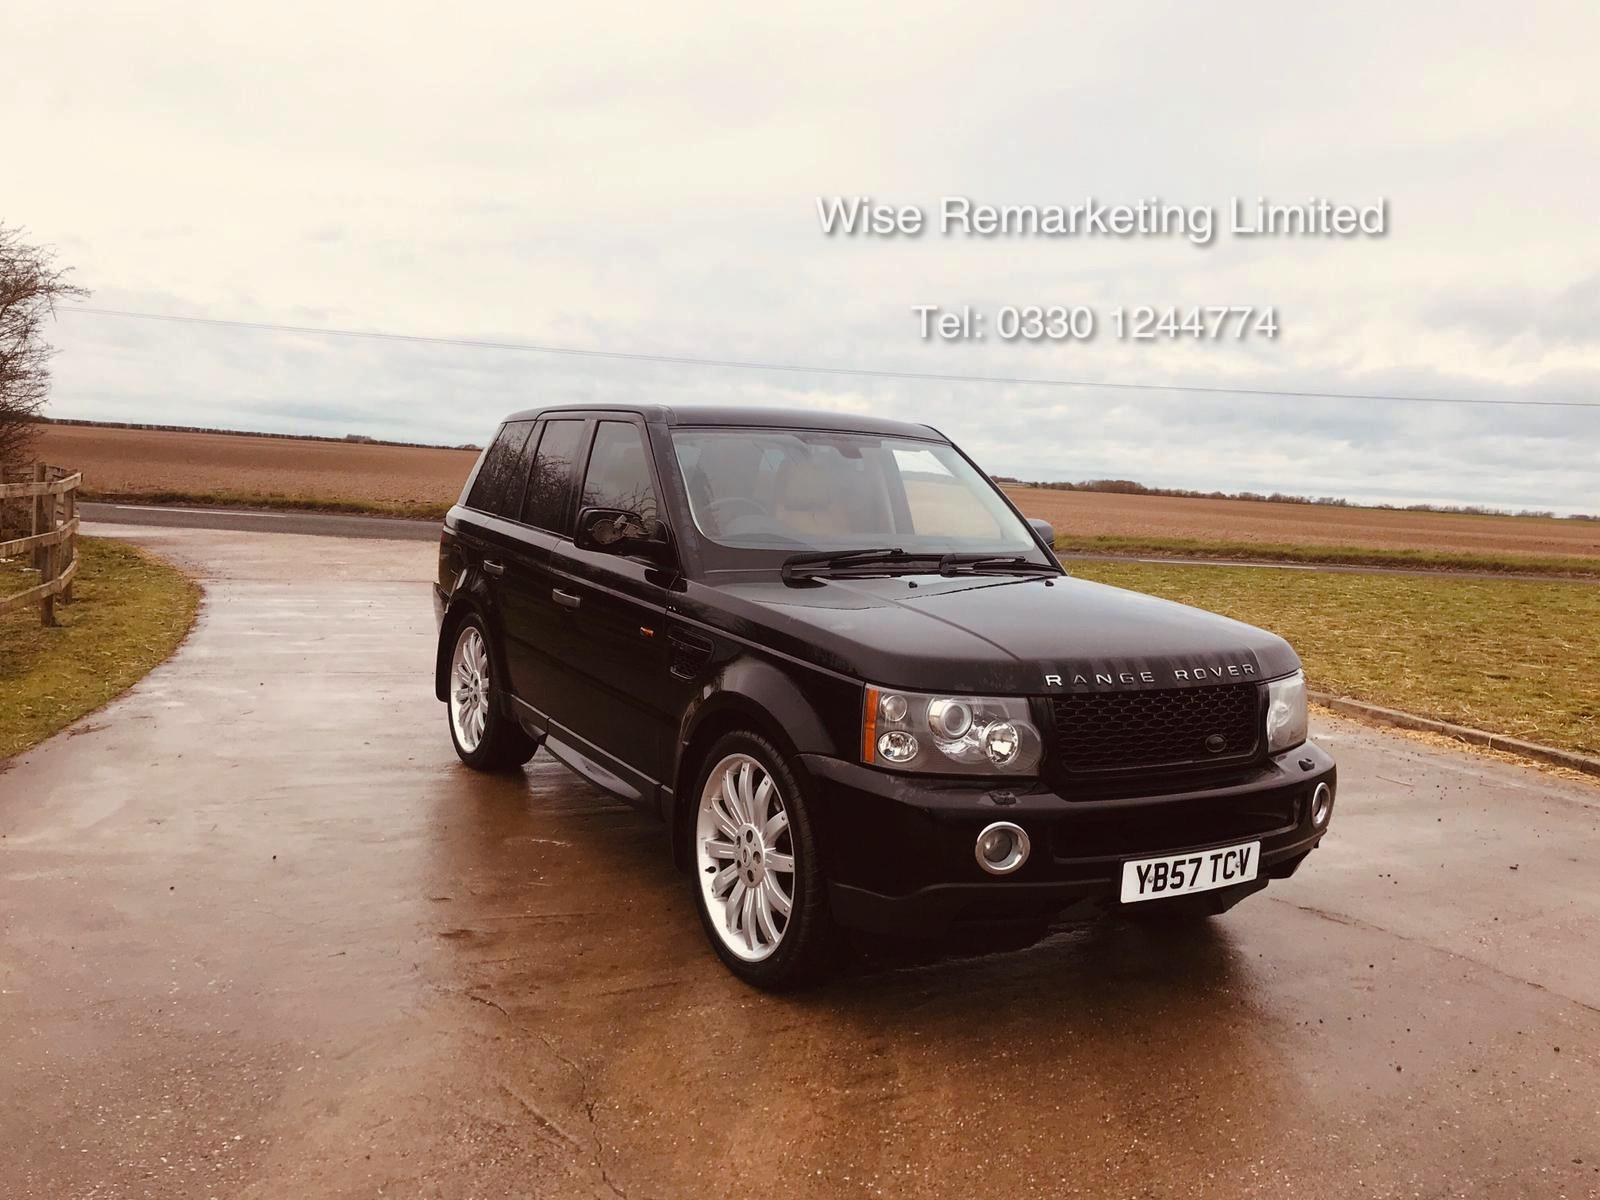 Range Rover Sport 2.7 TDV6 HSE Auto - 2008 Model - Cream Leather - Sat Nav - Heated Seats - Image 3 of 19